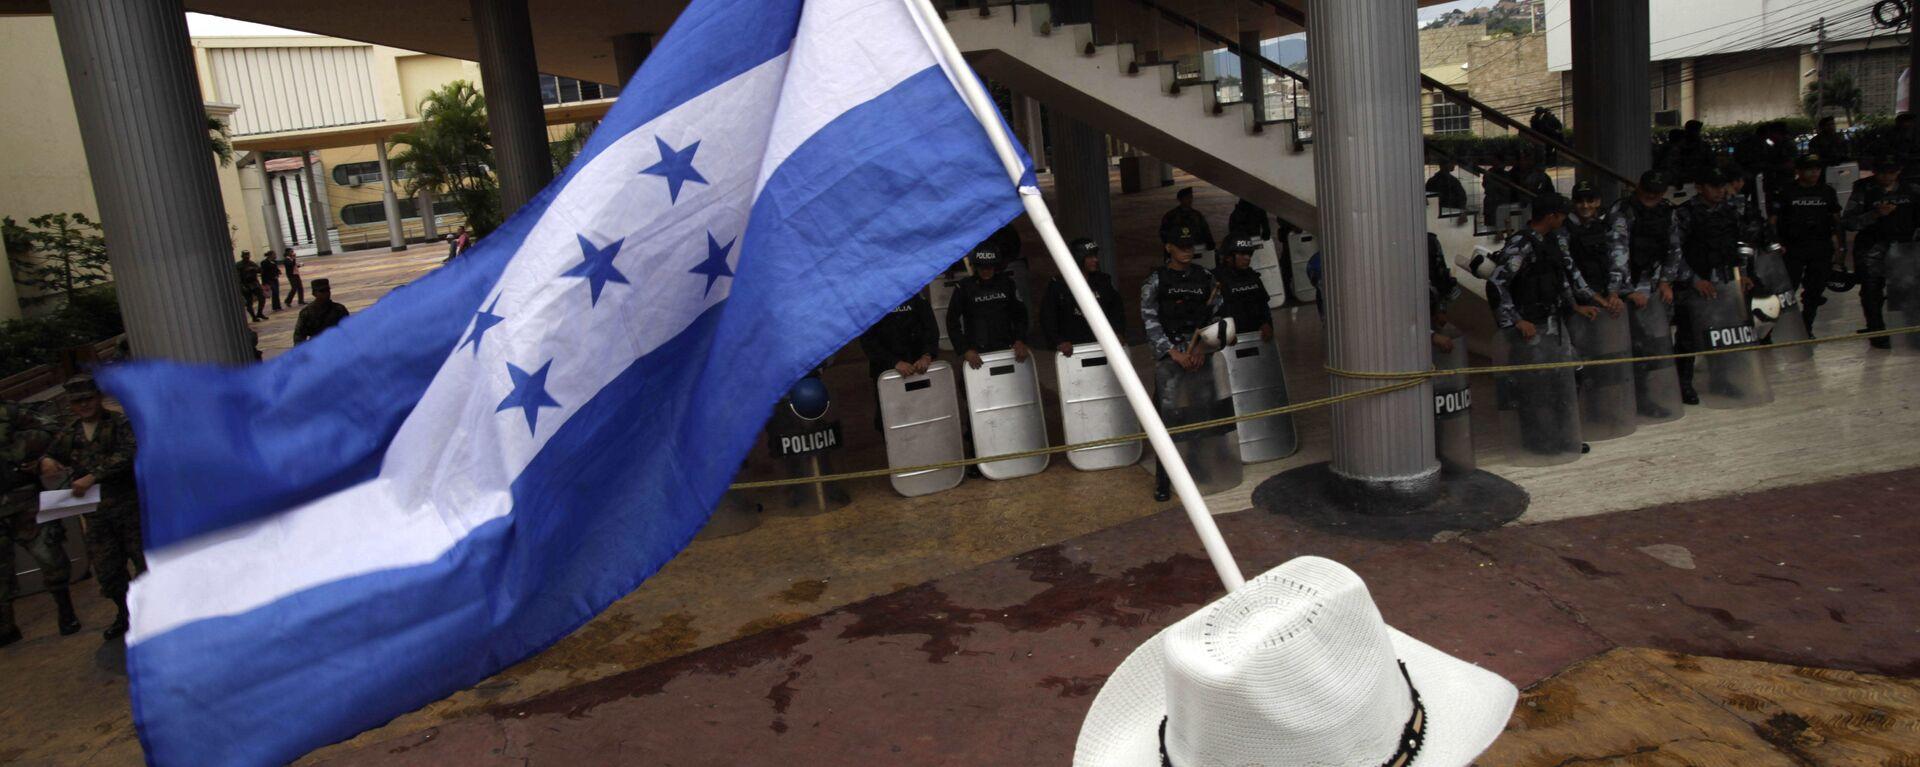 Bandera de Honduras - Sputnik Mundo, 1920, 06.10.2021